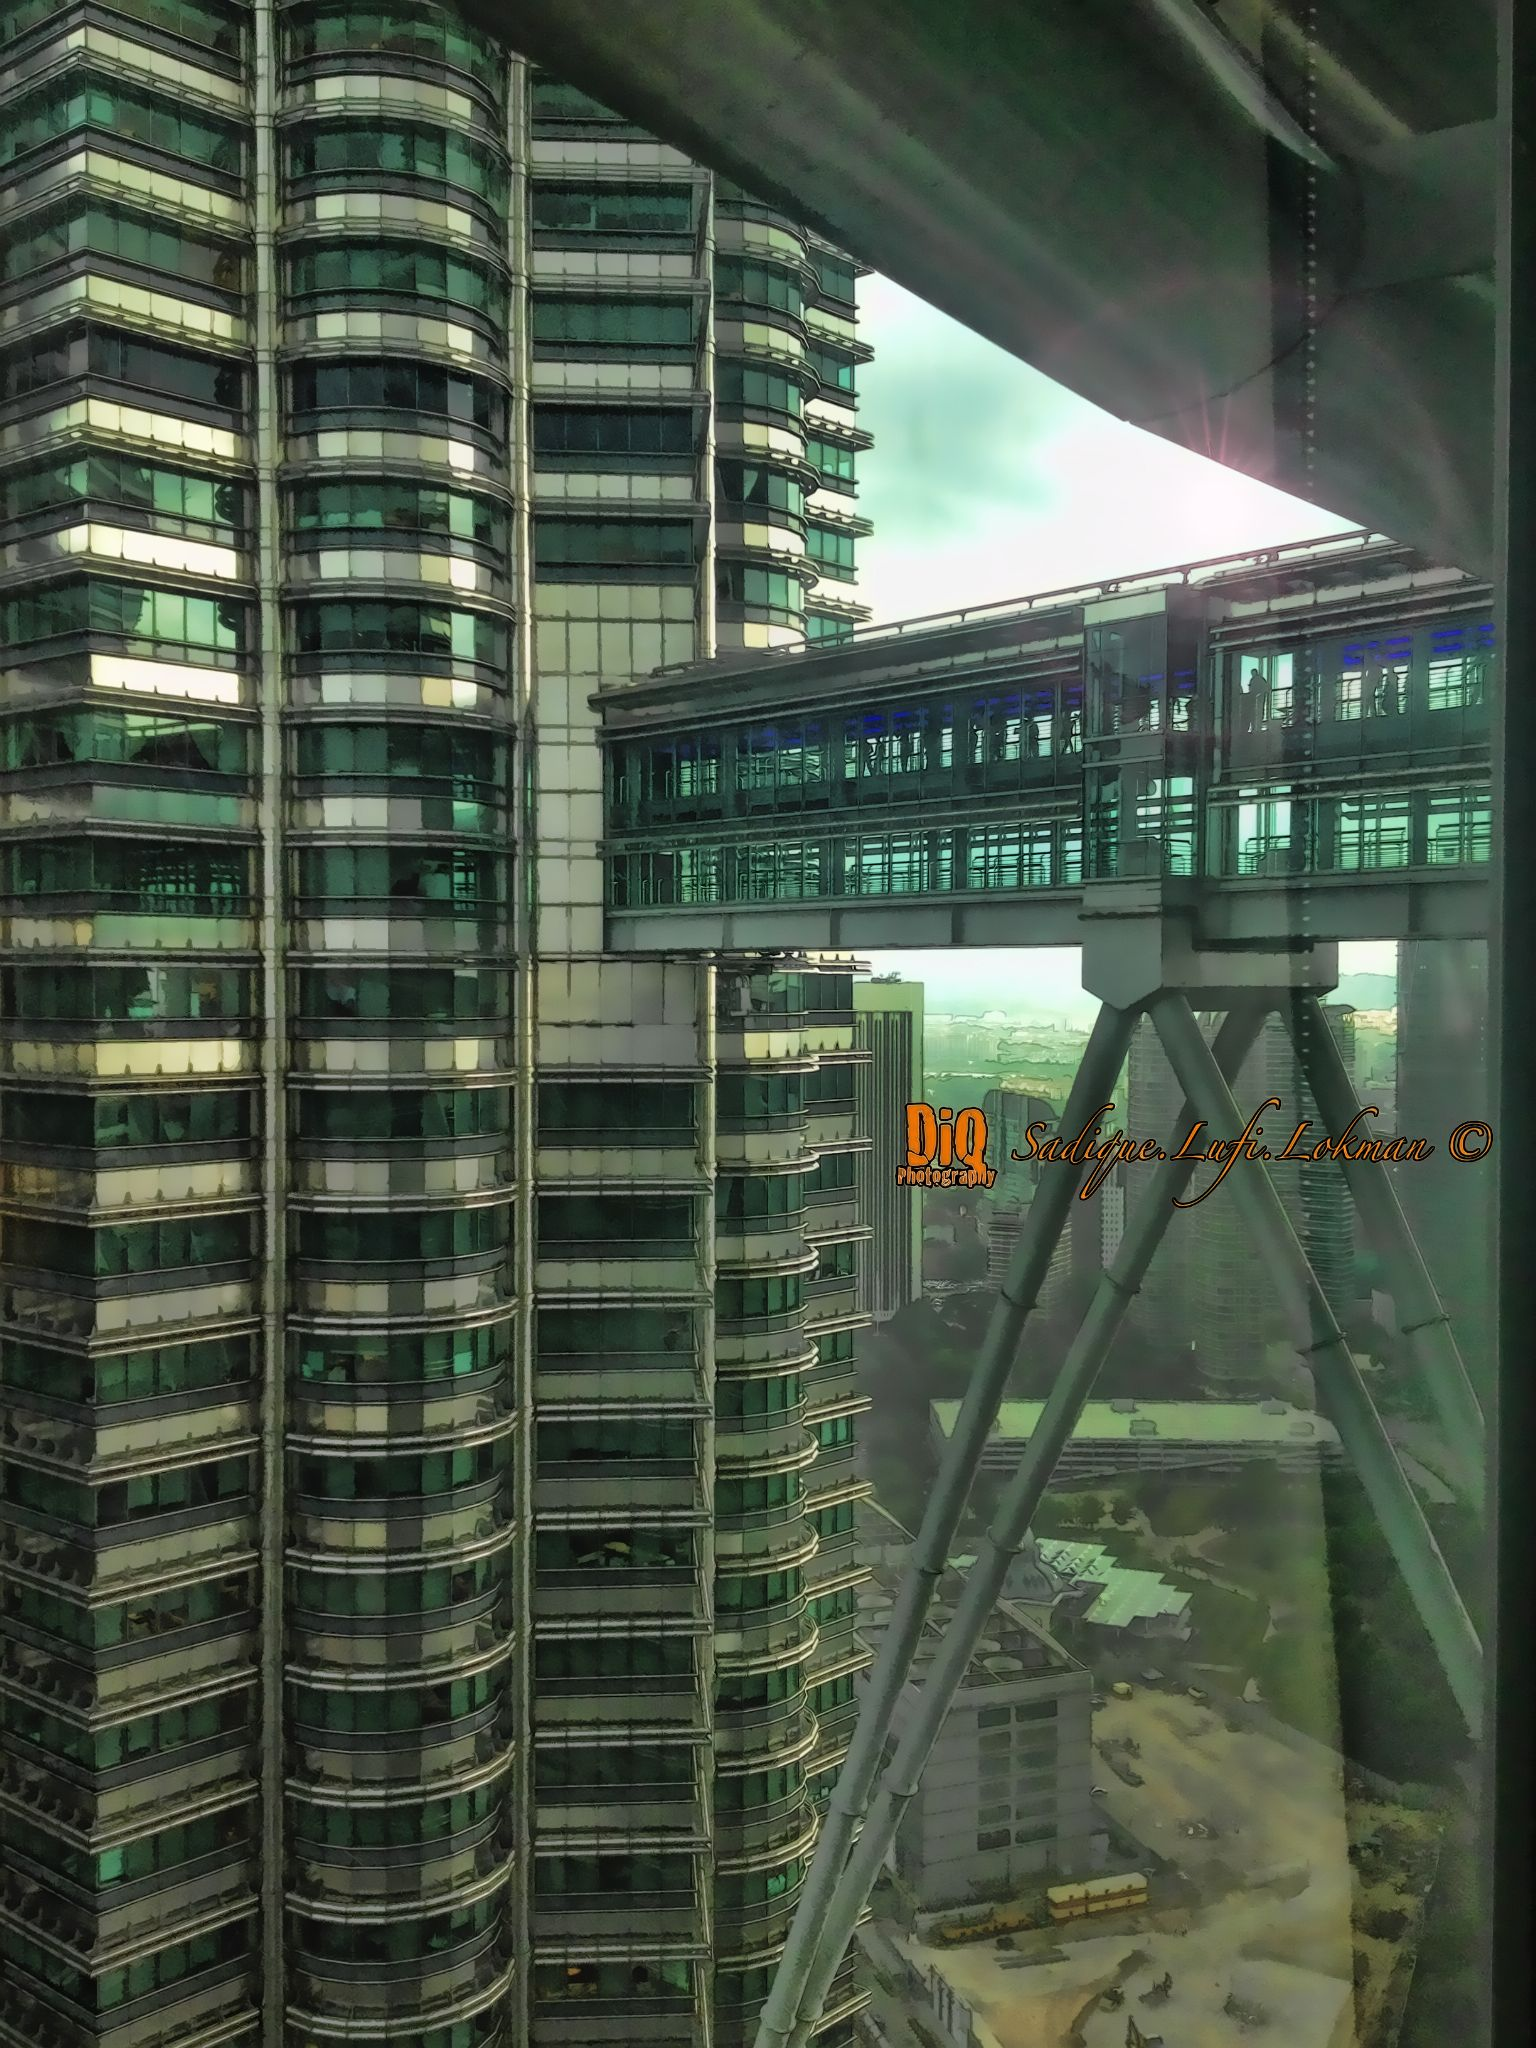 Level 40, Tower 1, PETRONAS Twin Towers by Sadique Lufi Lokman